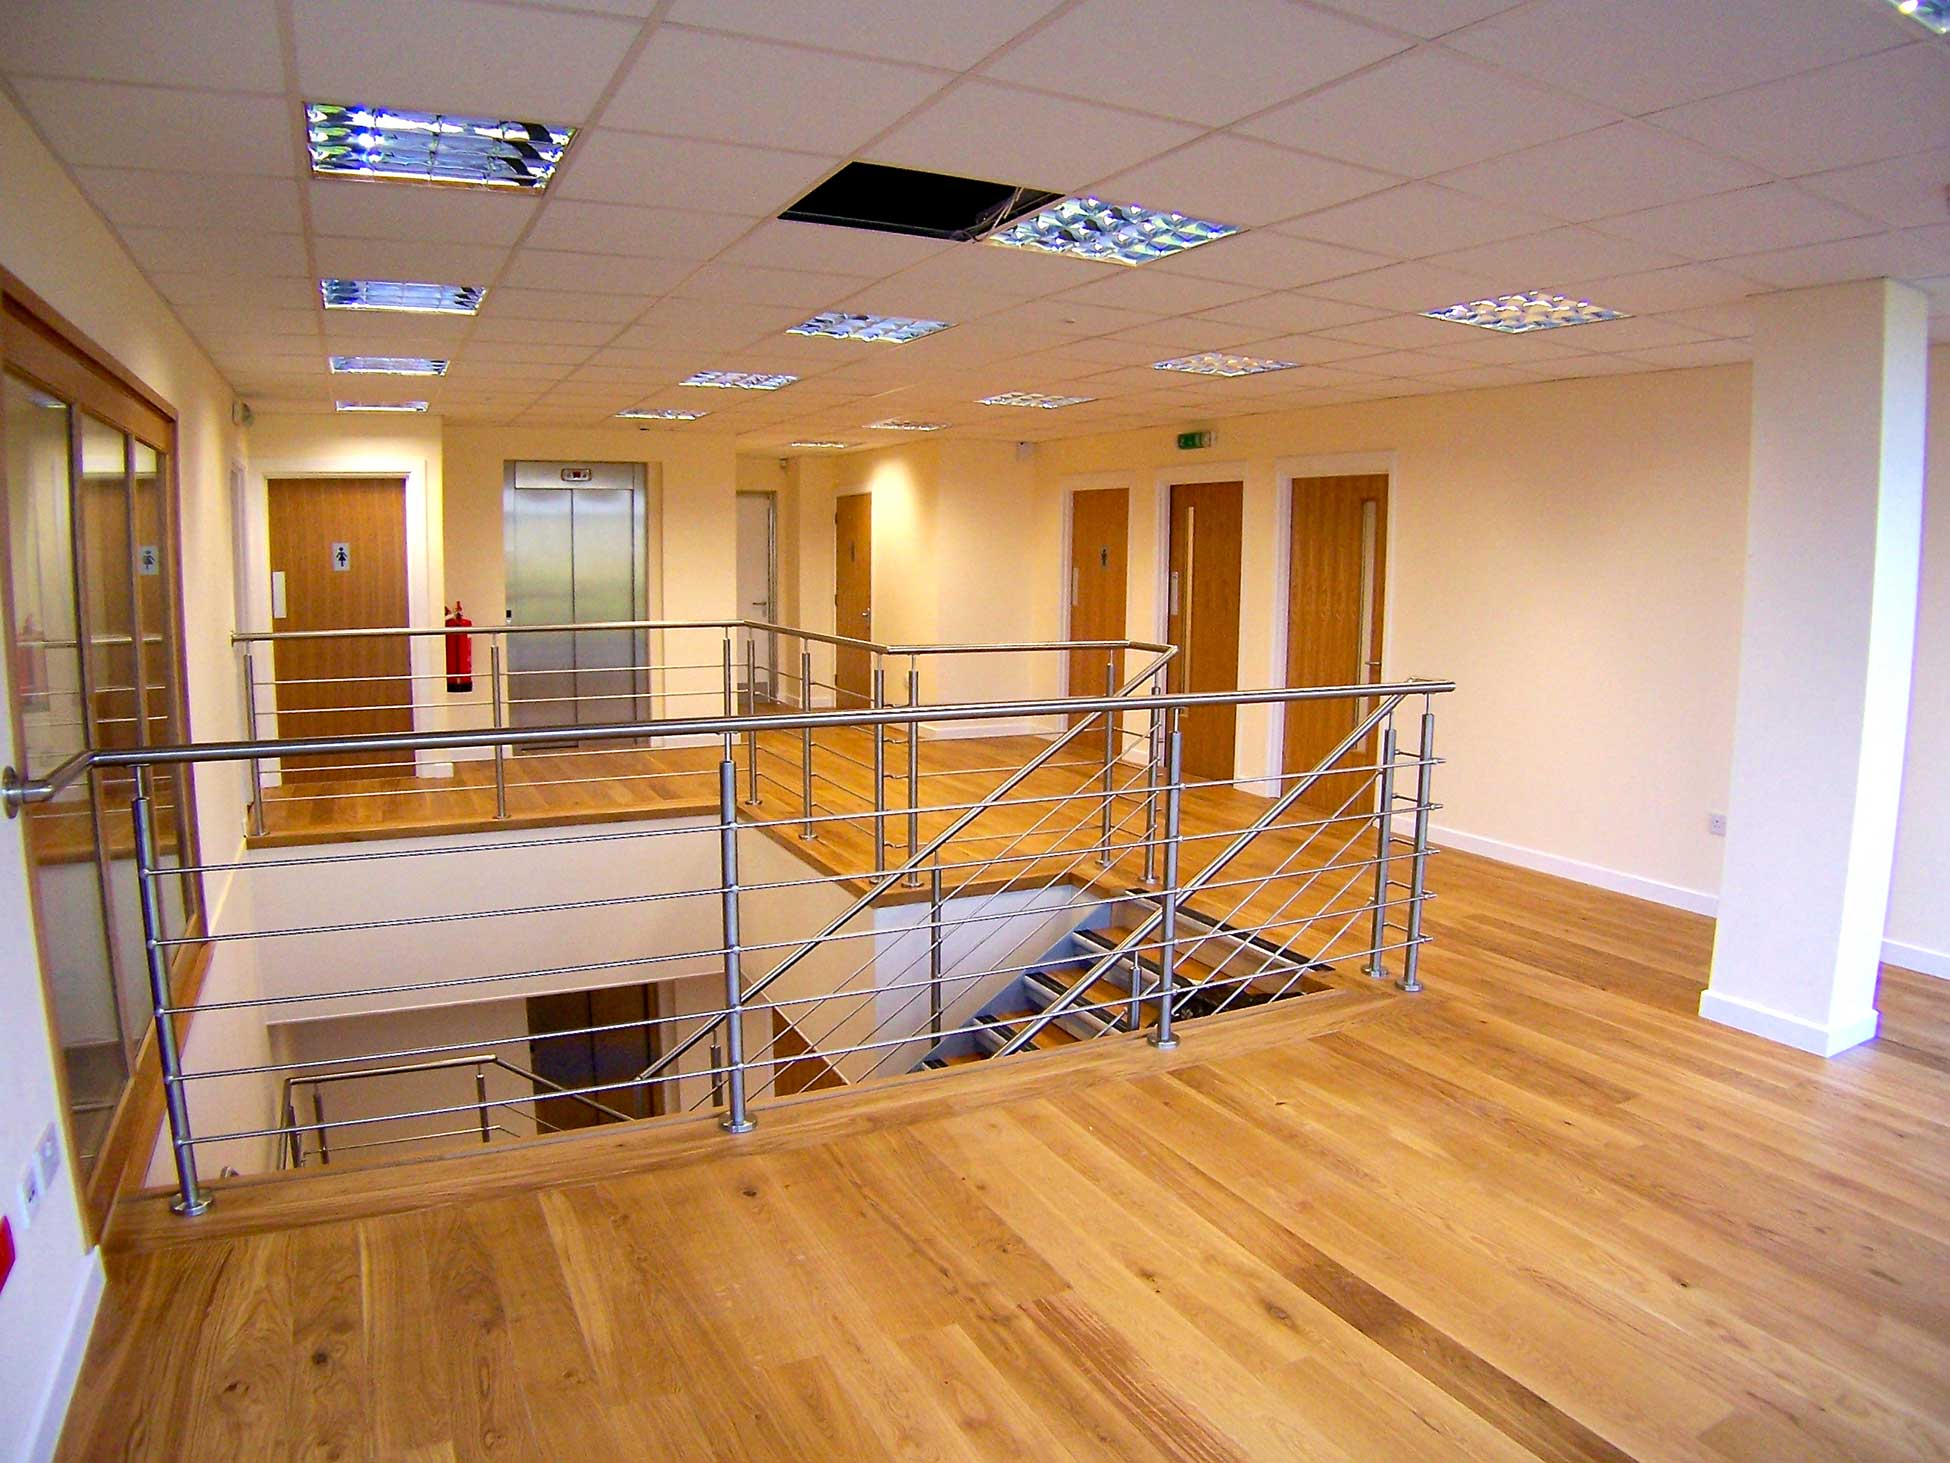 Home - Mezzanine Floor